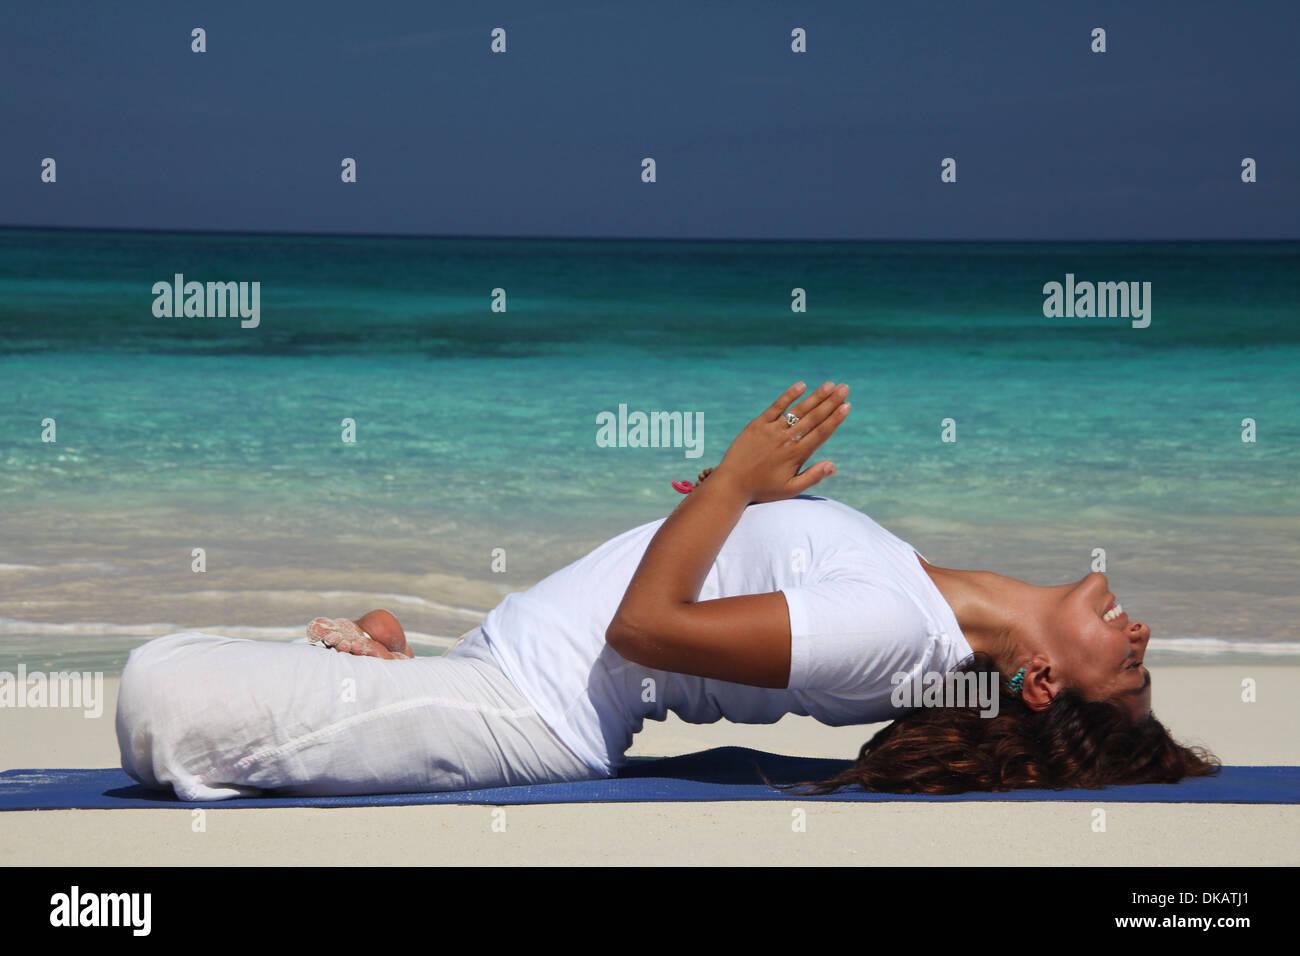 Young Woman On Beach Doing Yoga Paradise Island Nassau Bahamas Stock Photo 63548409 Alamy